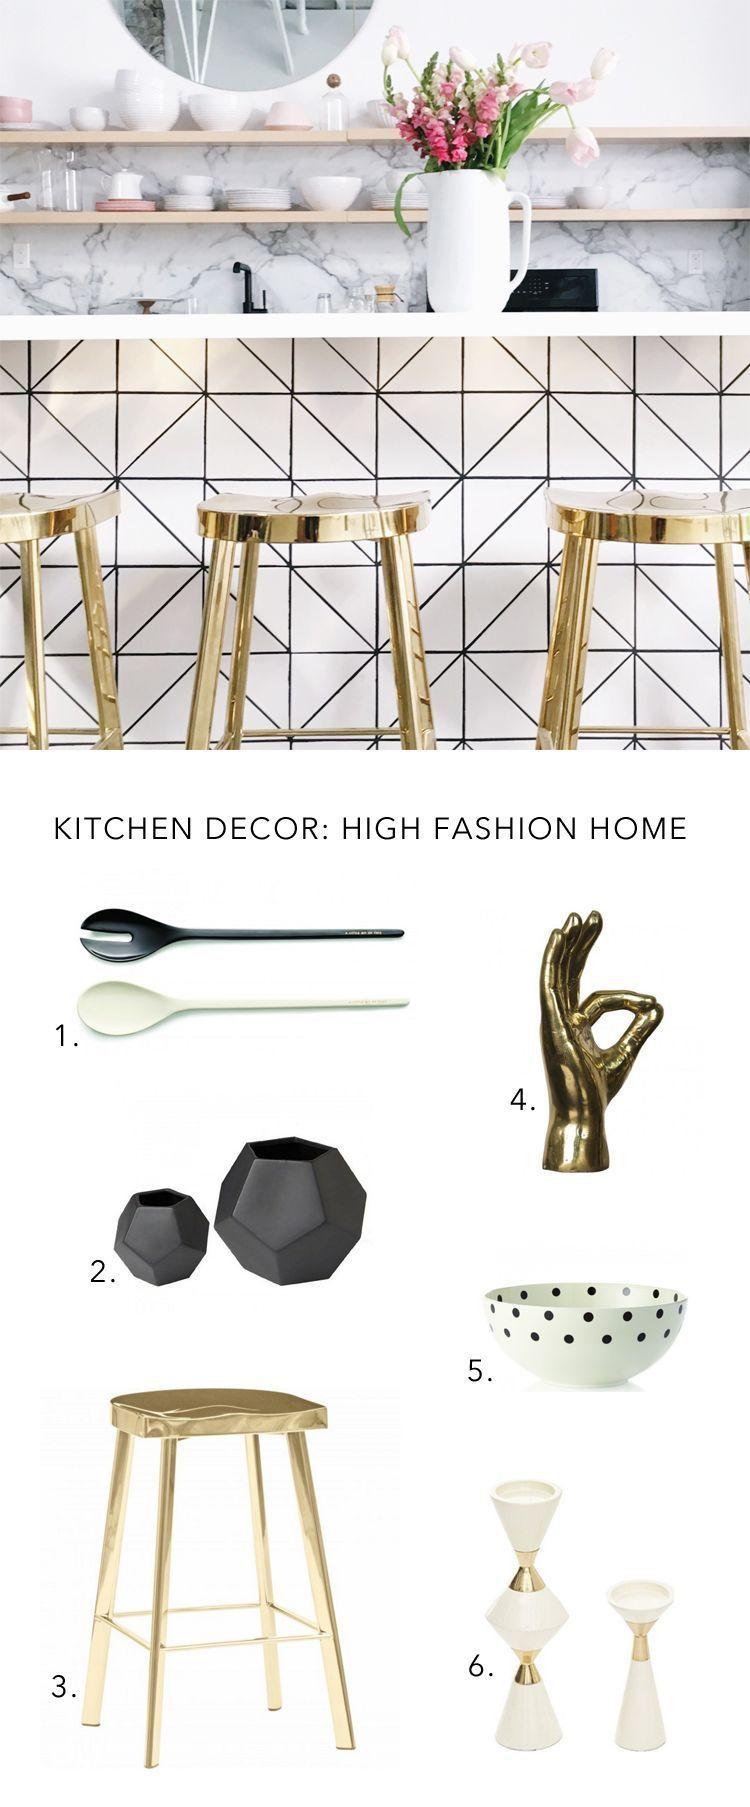 modern kitchen decor with high fashion home creative kitchen decor rh pinterest com